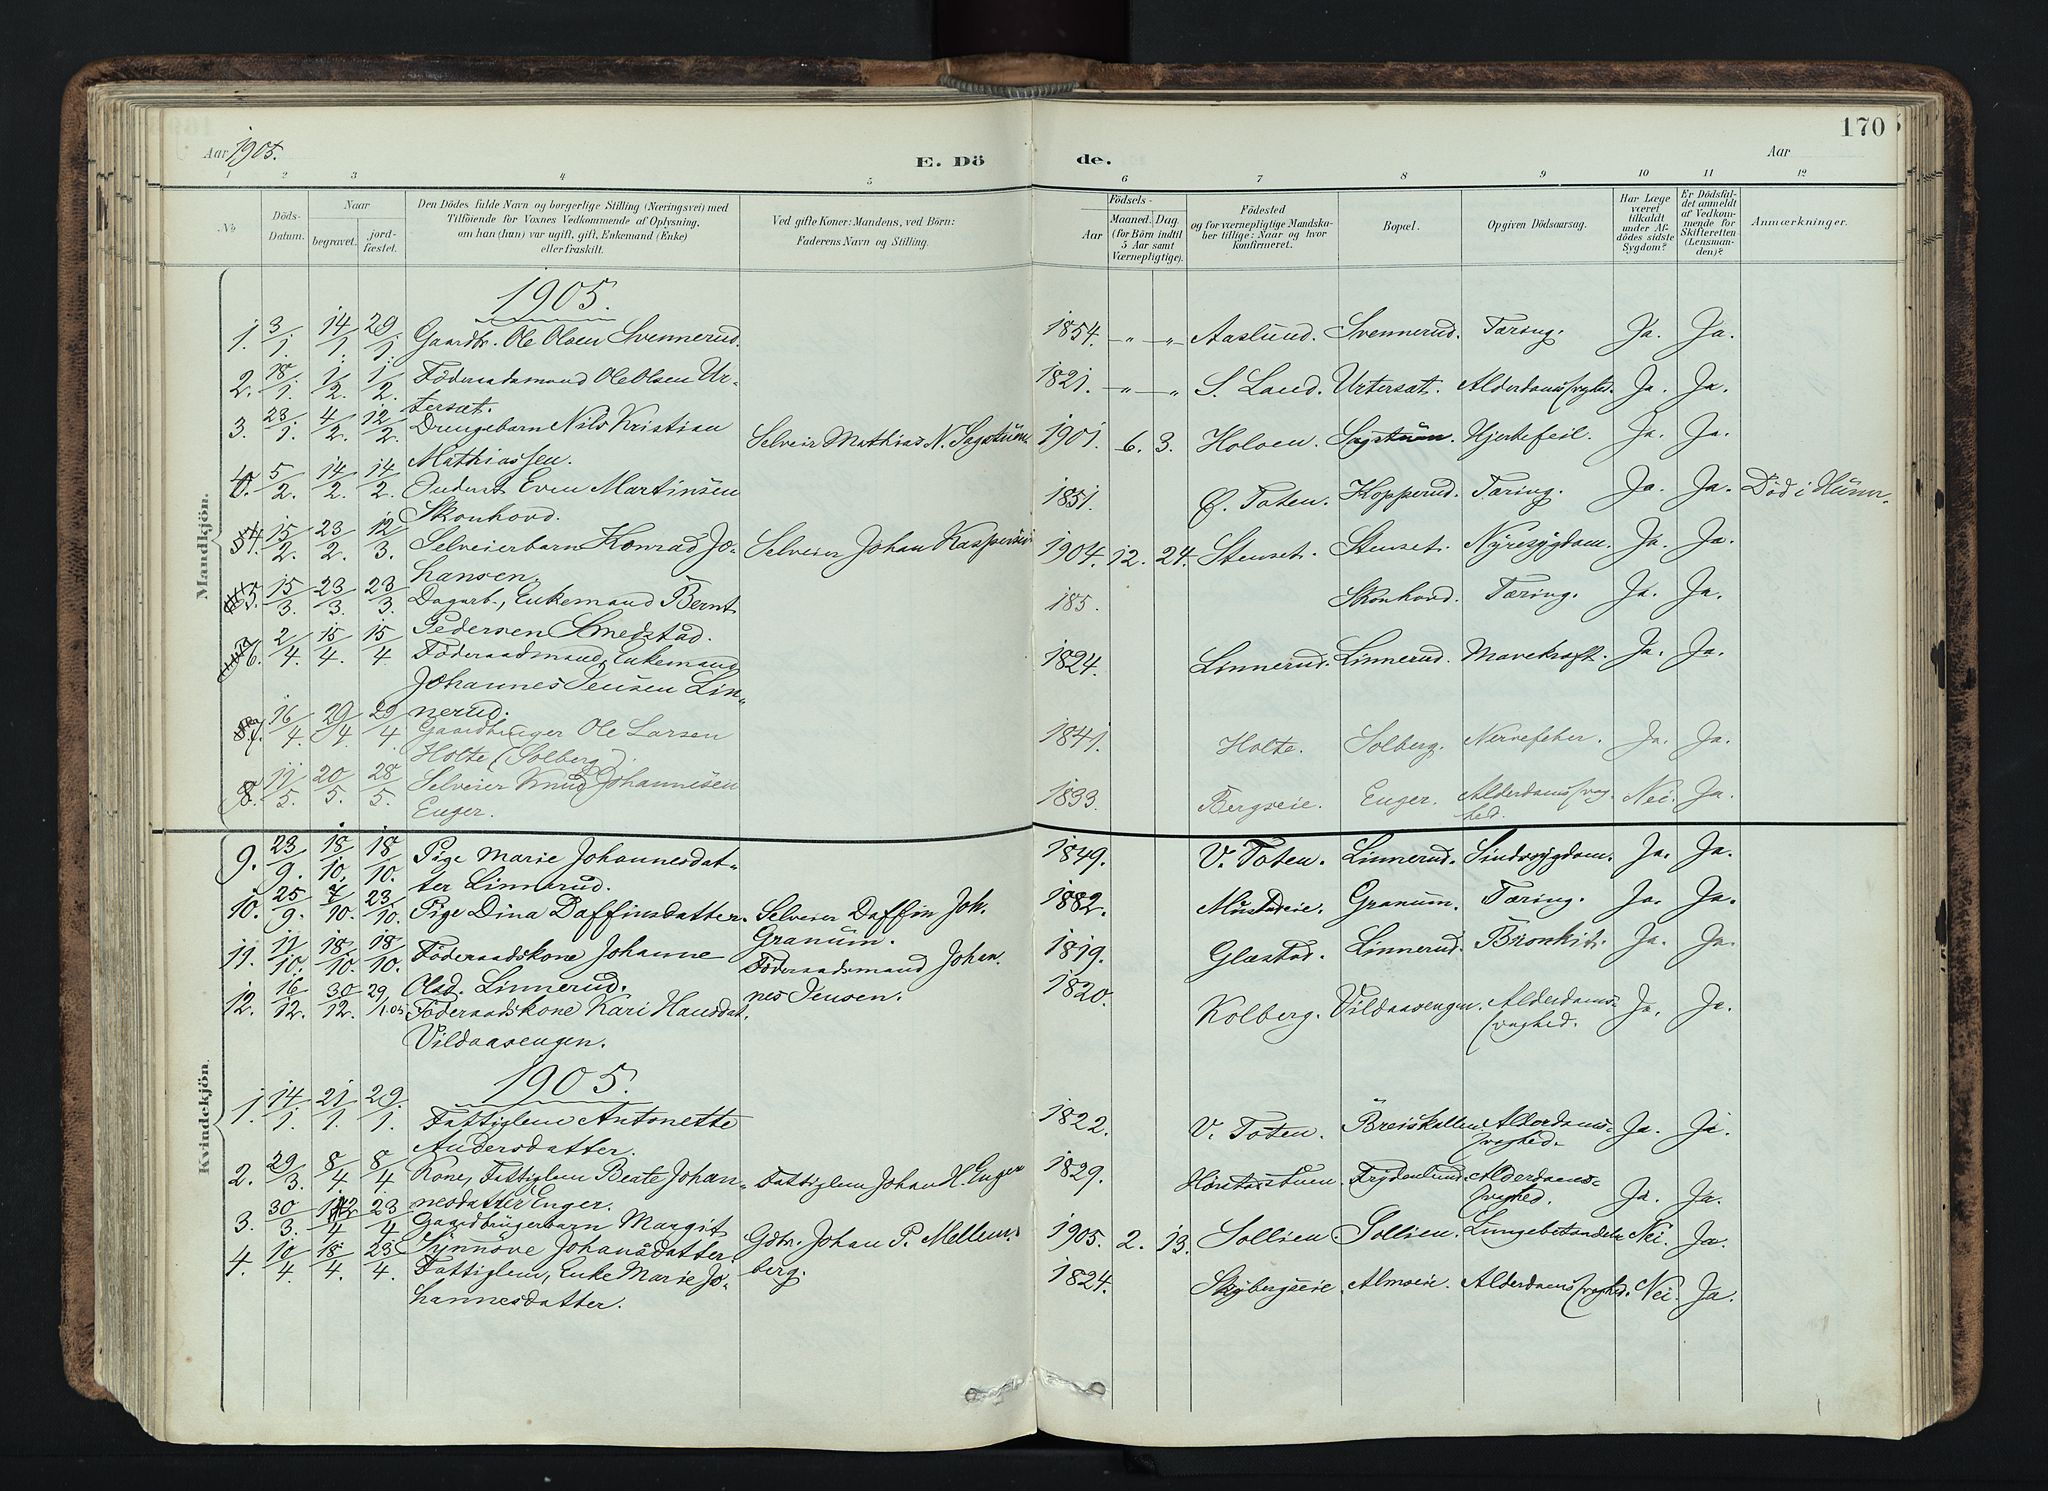 SAH, Vardal prestekontor, H/Ha/Haa/L0019: Ministerialbok nr. 19, 1893-1907, s. 170